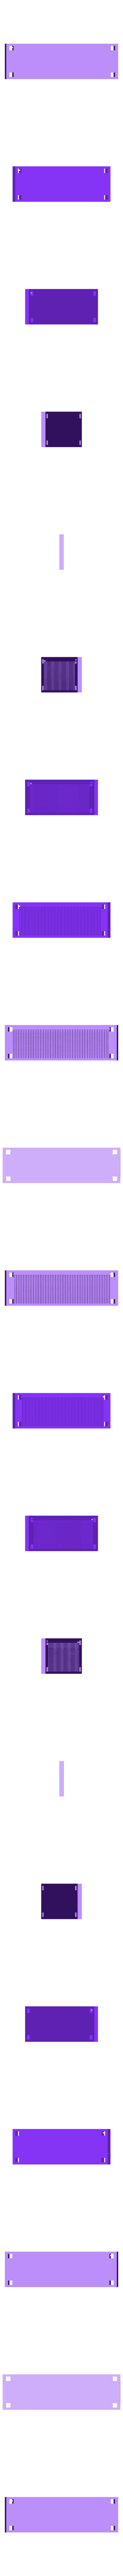 lath.STL Download free STL file # LIFEHACK3D-cajamuchiforma • Model to 3D print, izanferrco